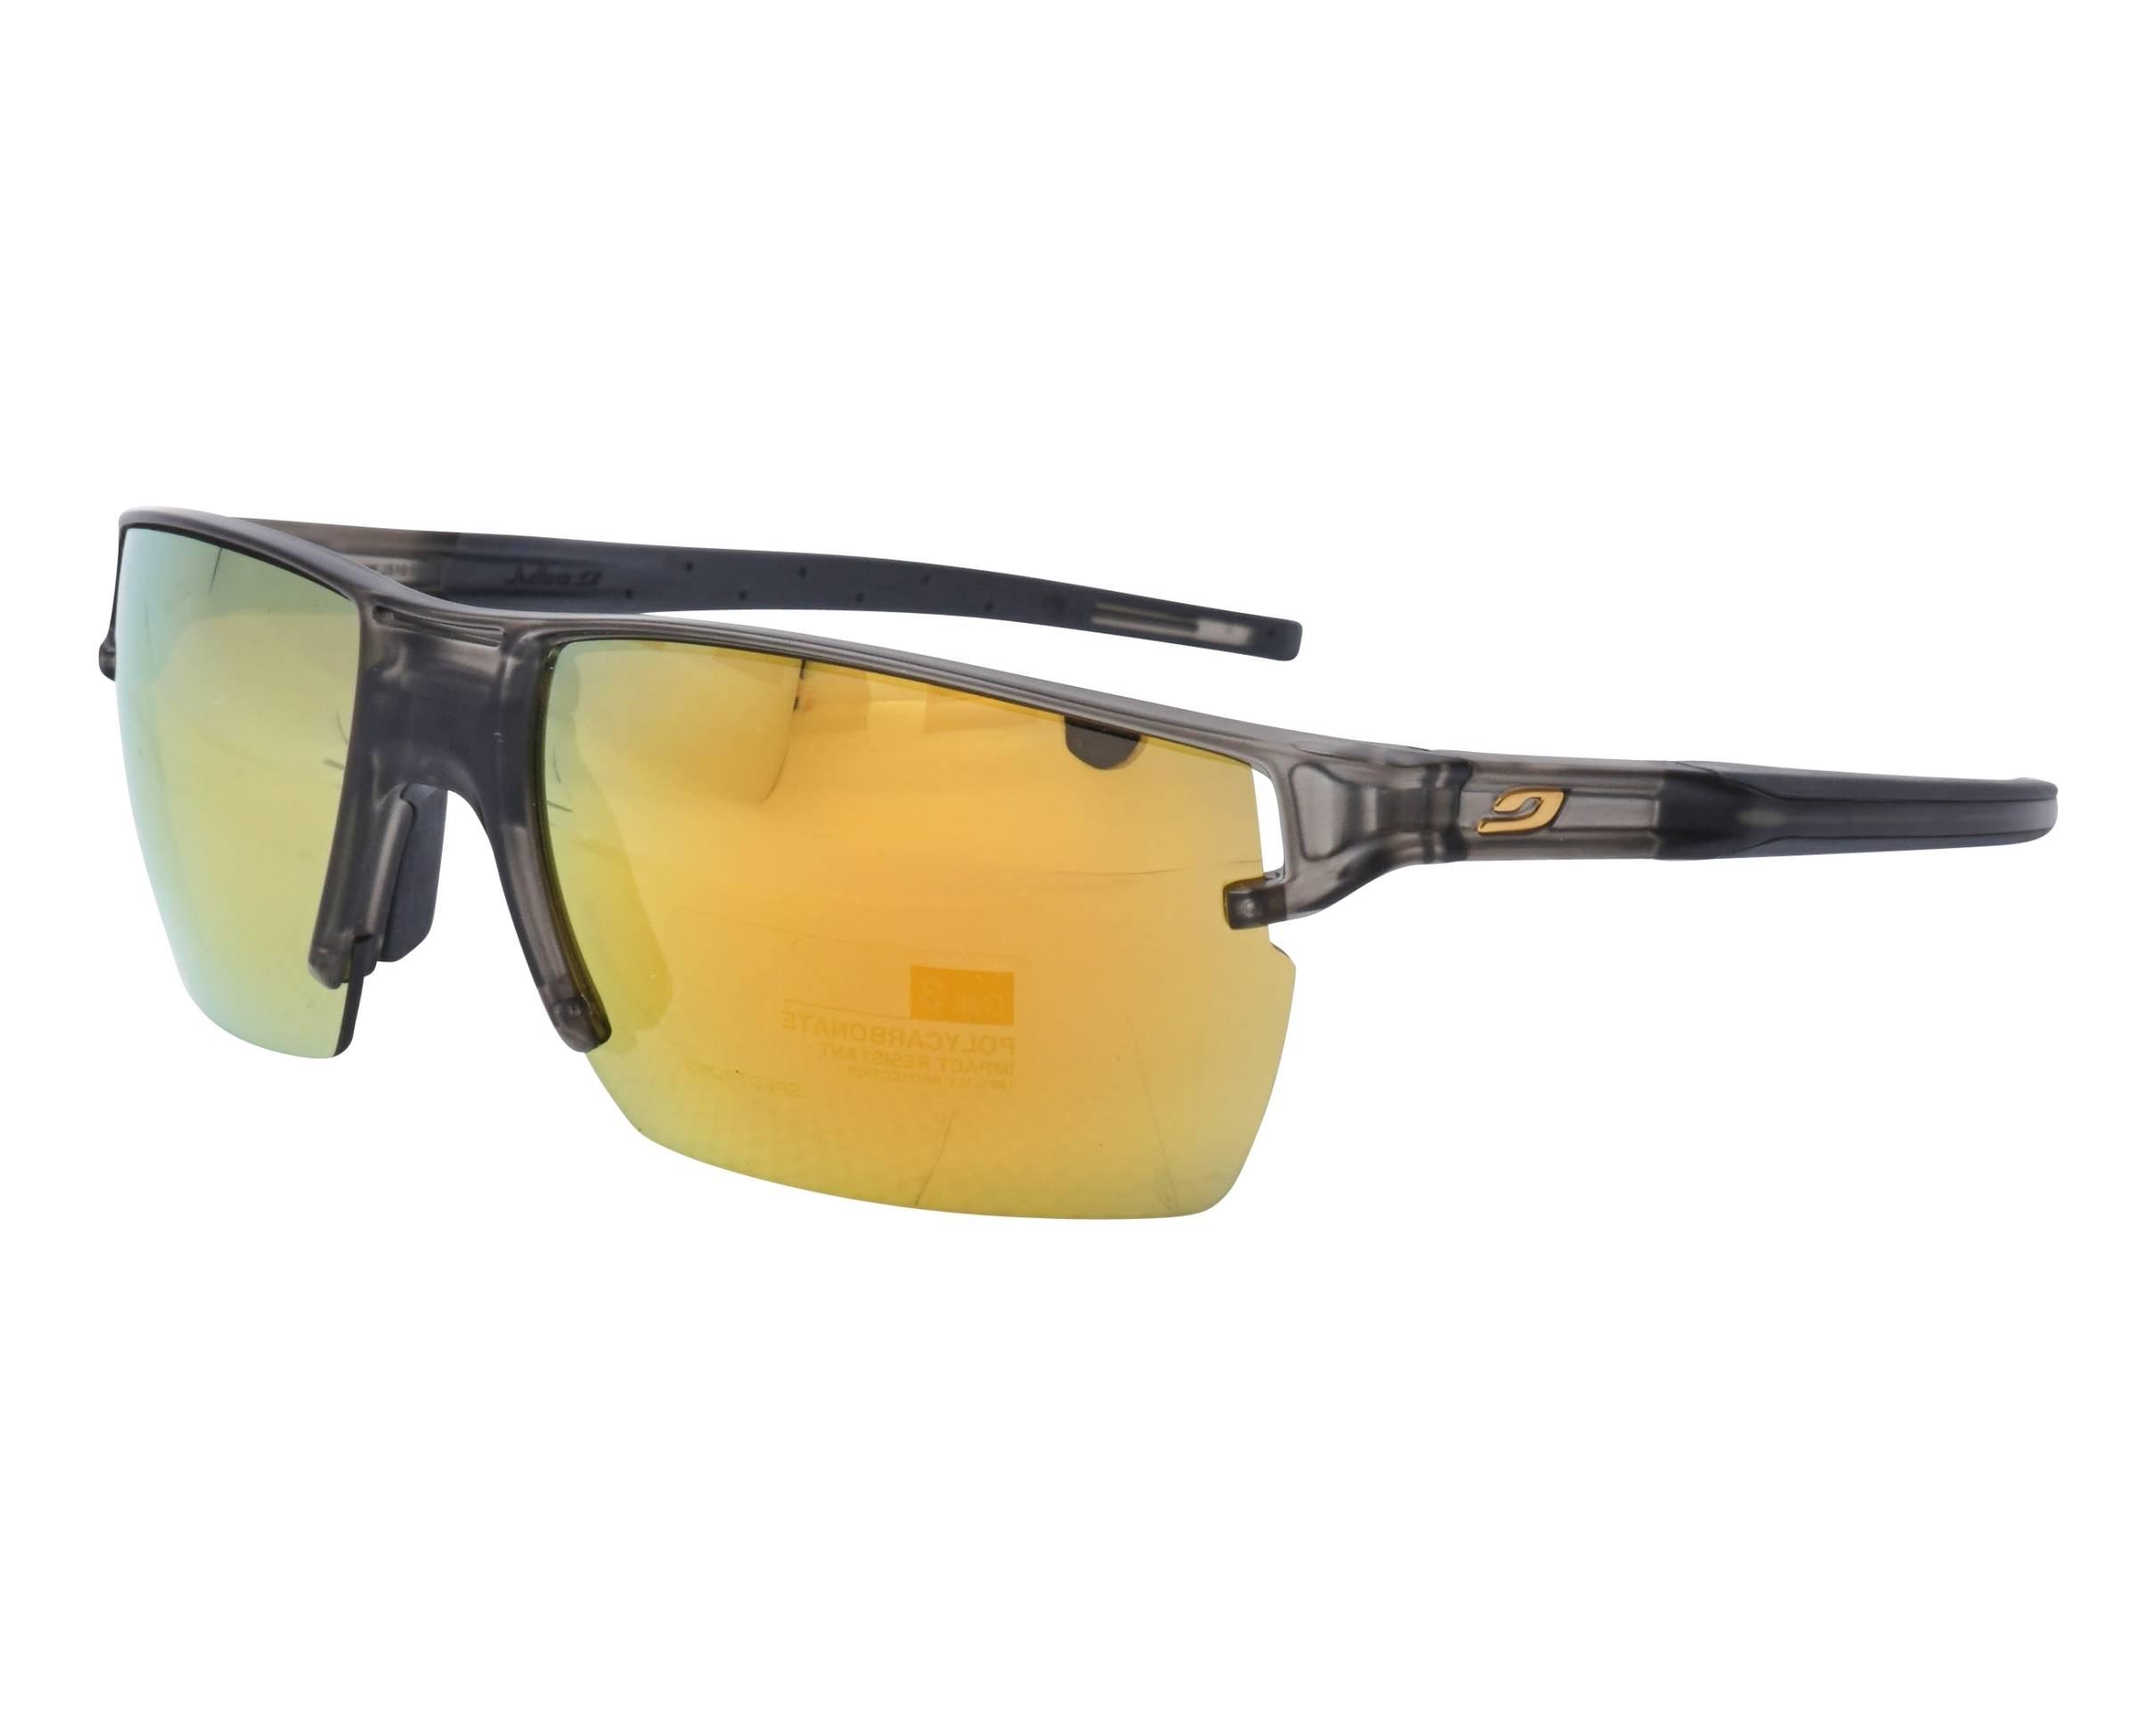 f12793af84202 Sunglasses Julbo J519 1154 61-18 Grey Grey profile view